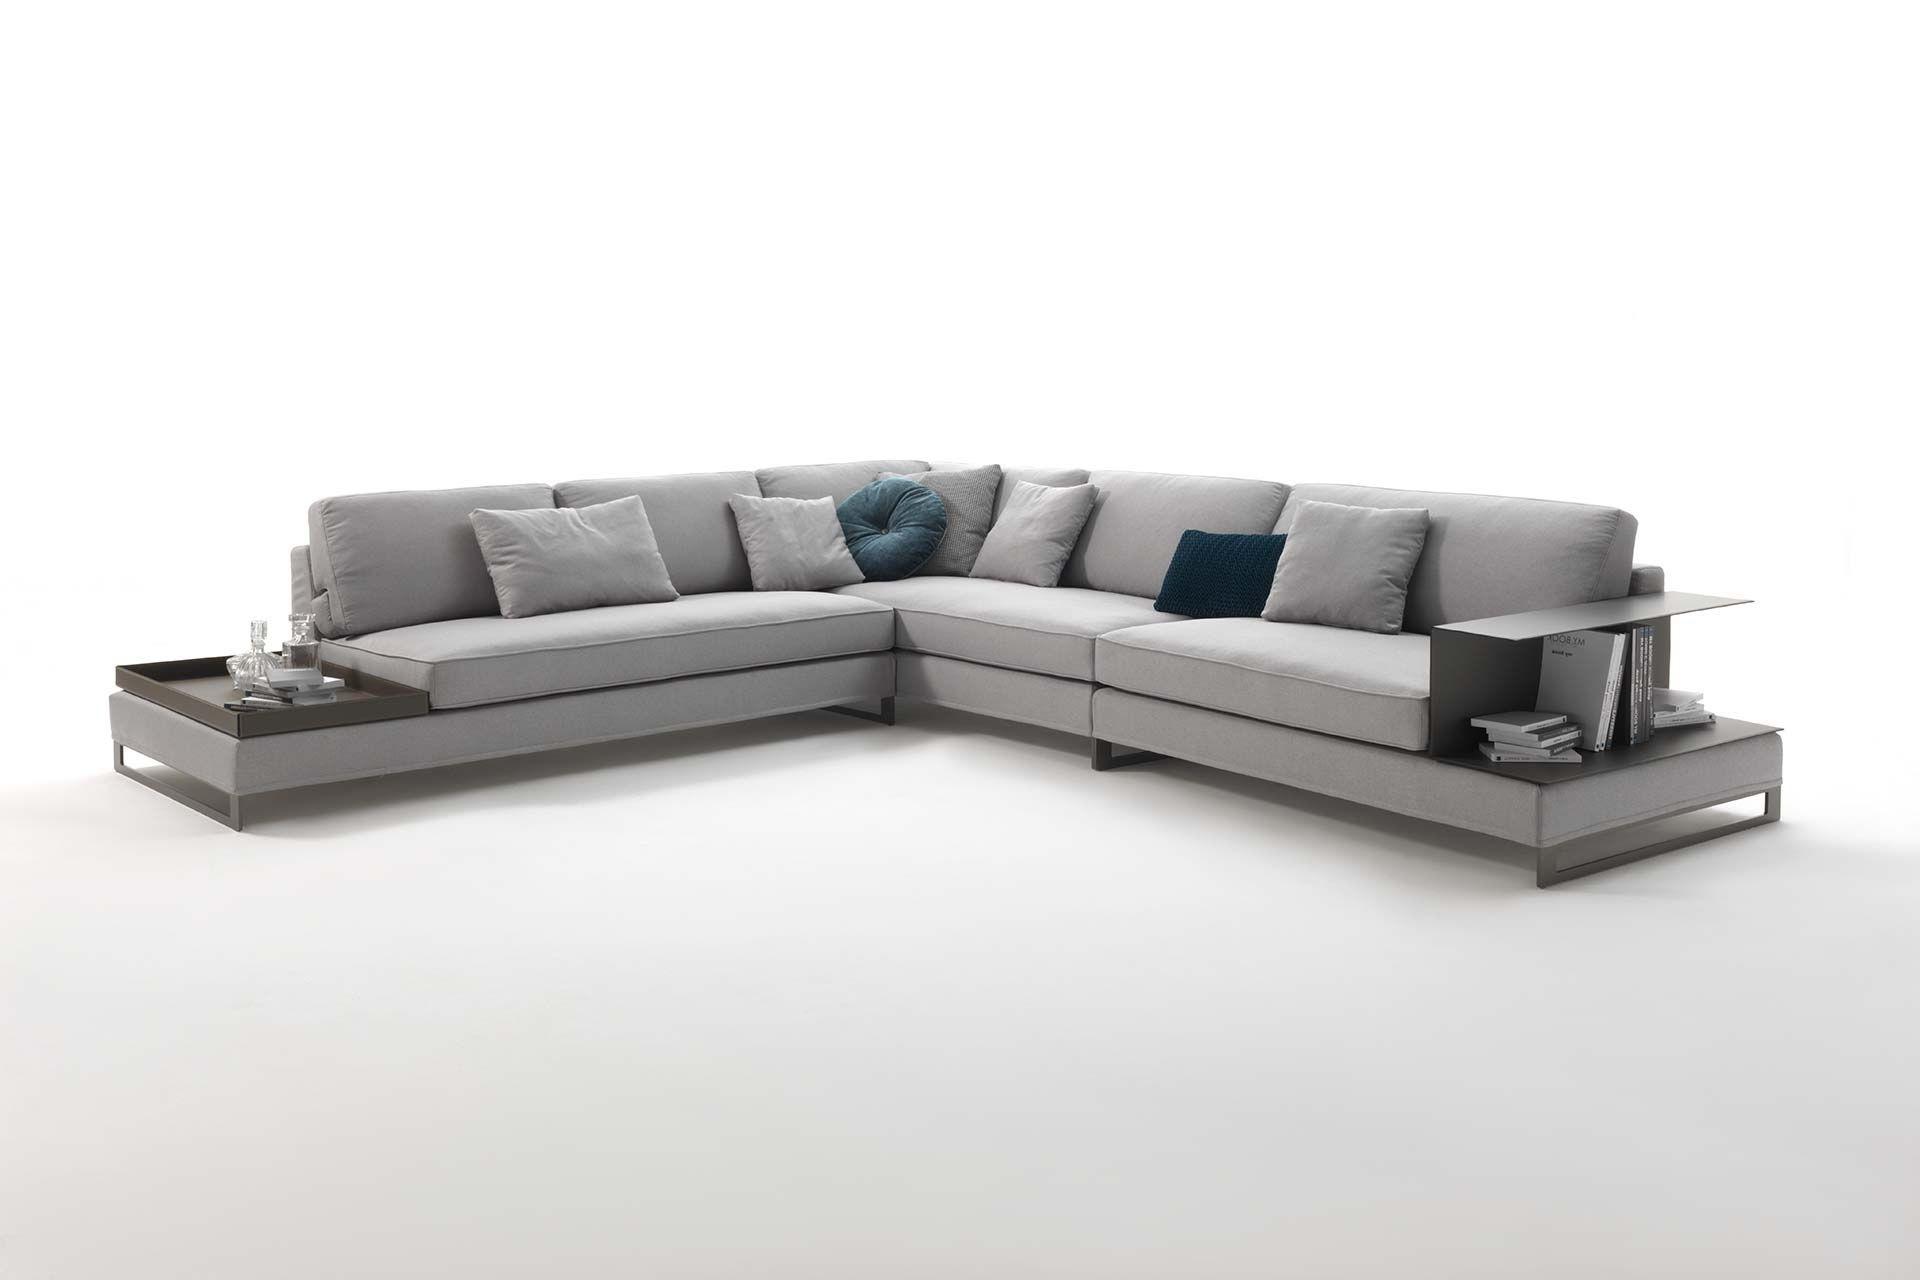 Contemporary Fabric Sofas Regarding Famous Modular Sofa / Contemporary / Fabric / Leather – Davis Case (View 3 of 15)